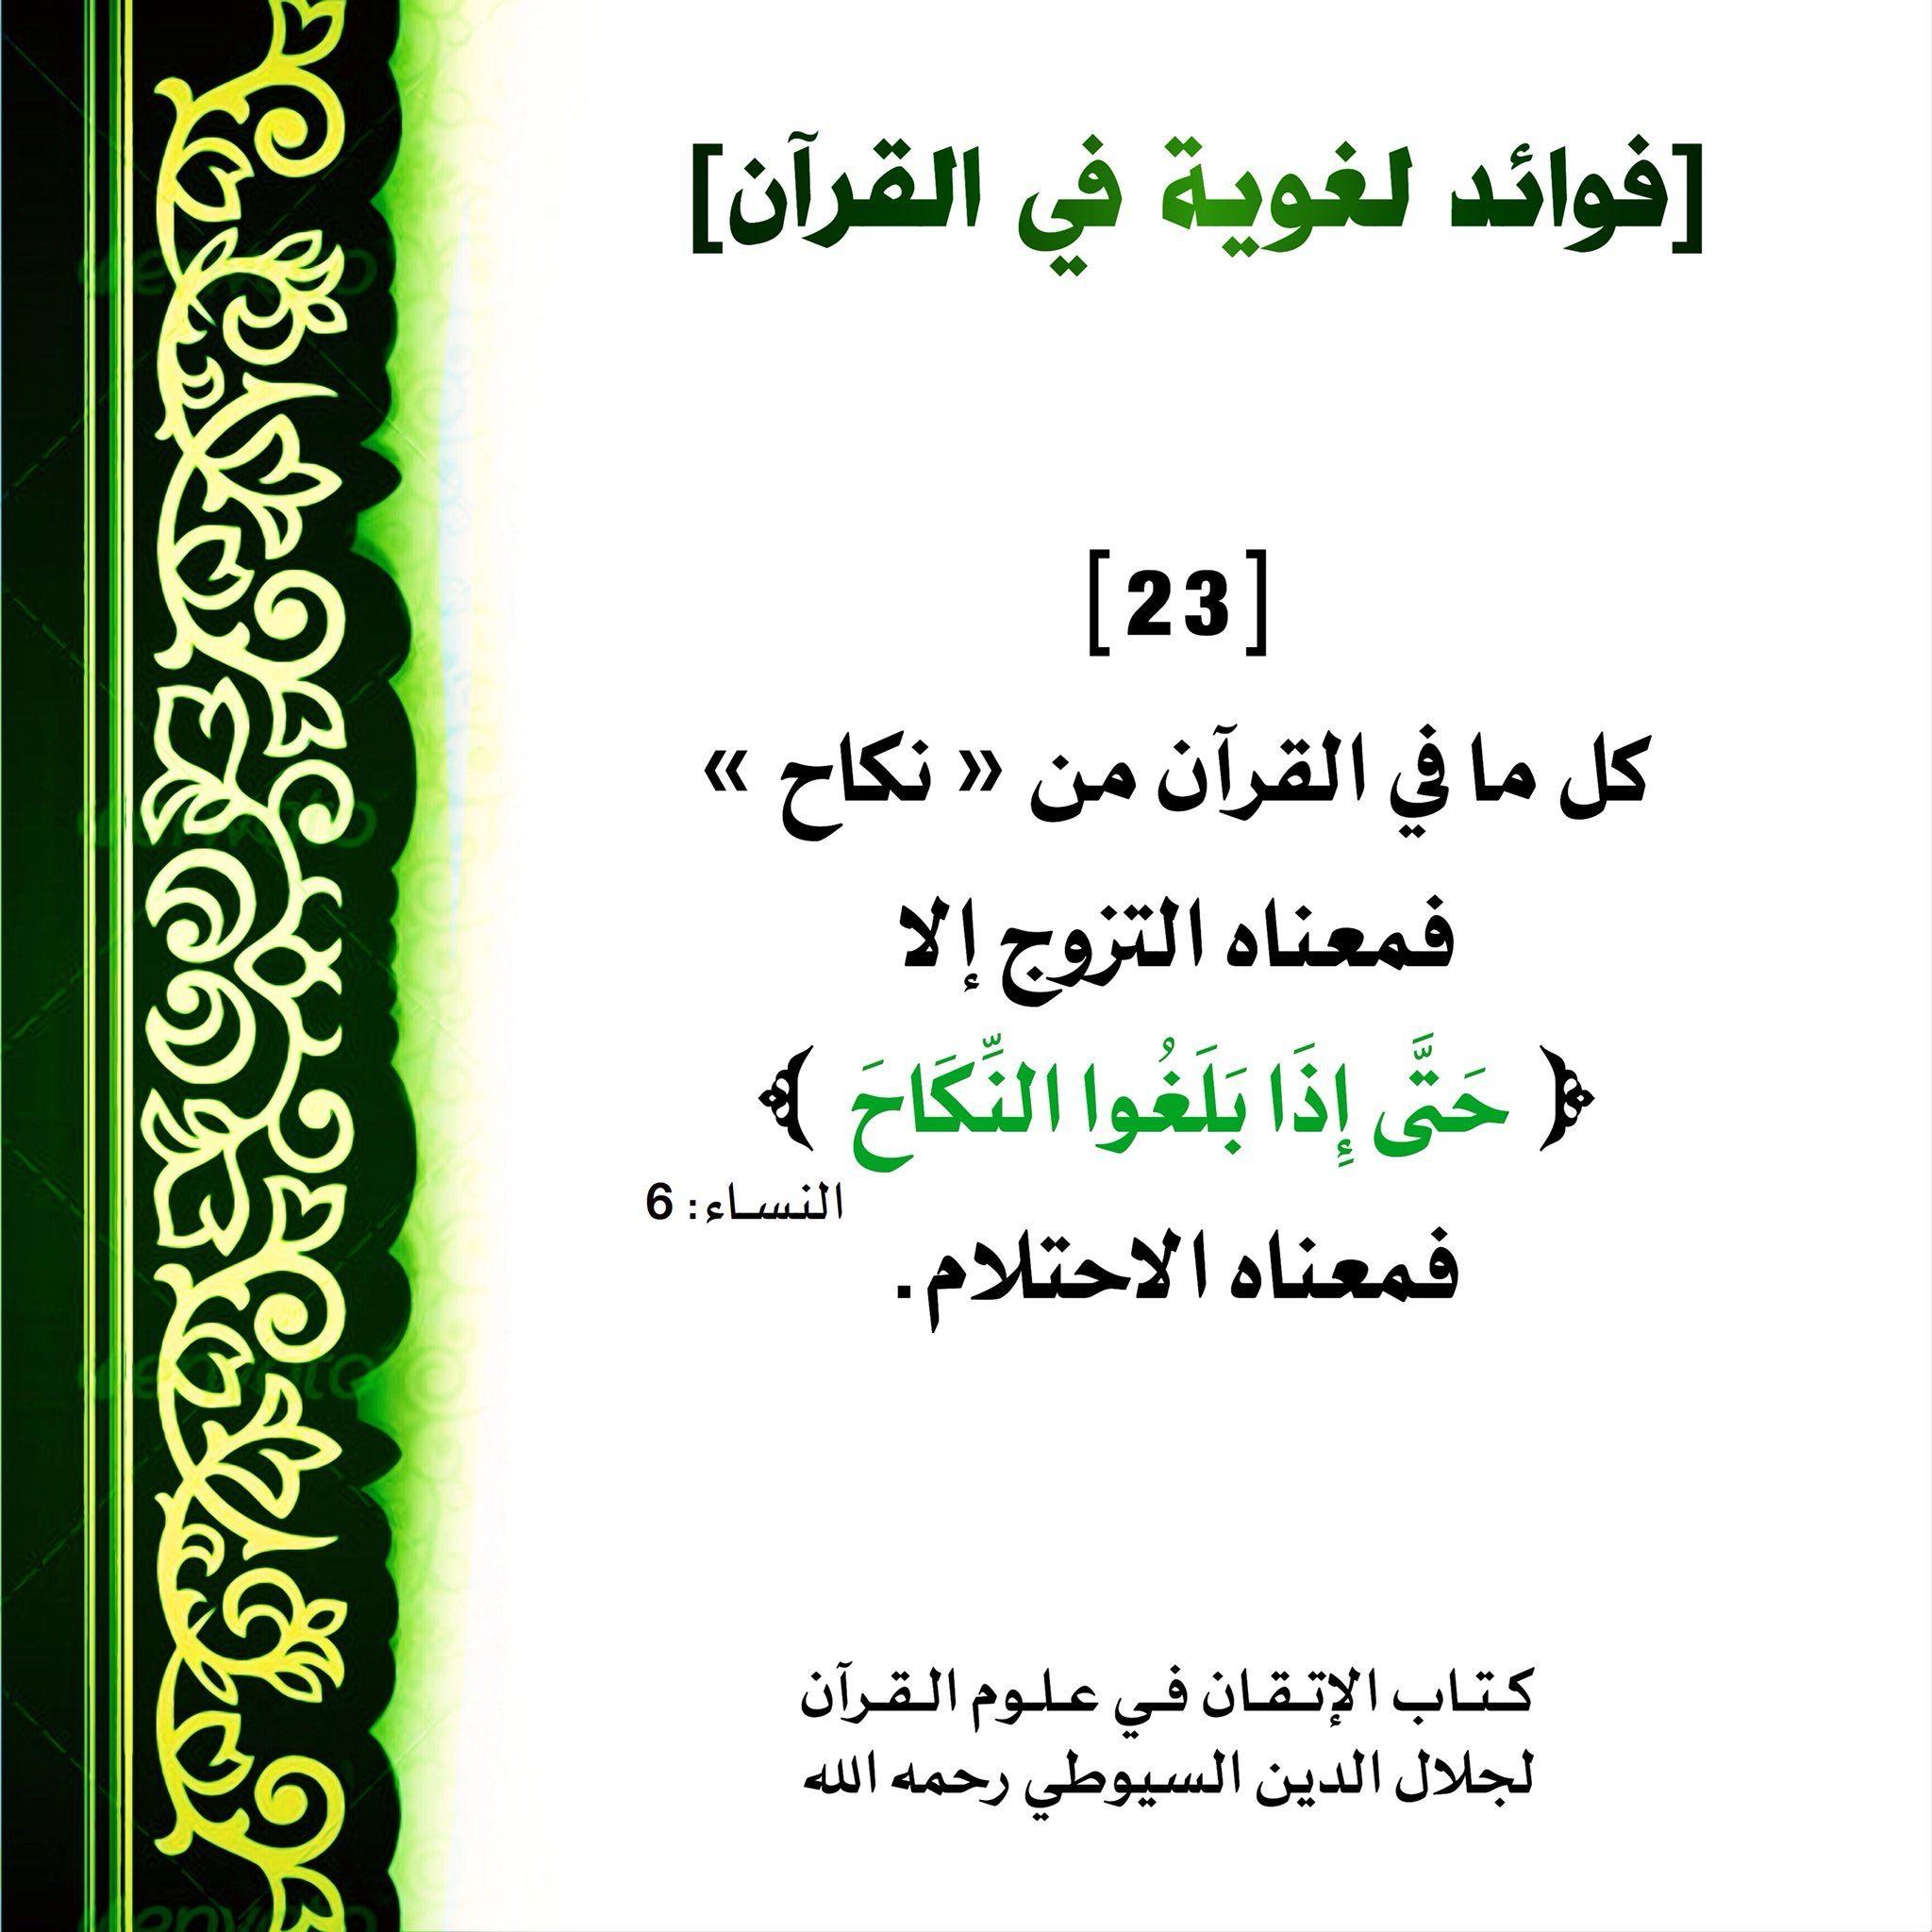 Pin By الأثر الجميل On فوائد لغوية في القرآن Islamic Love Quotes Words Quotes Quran Verses